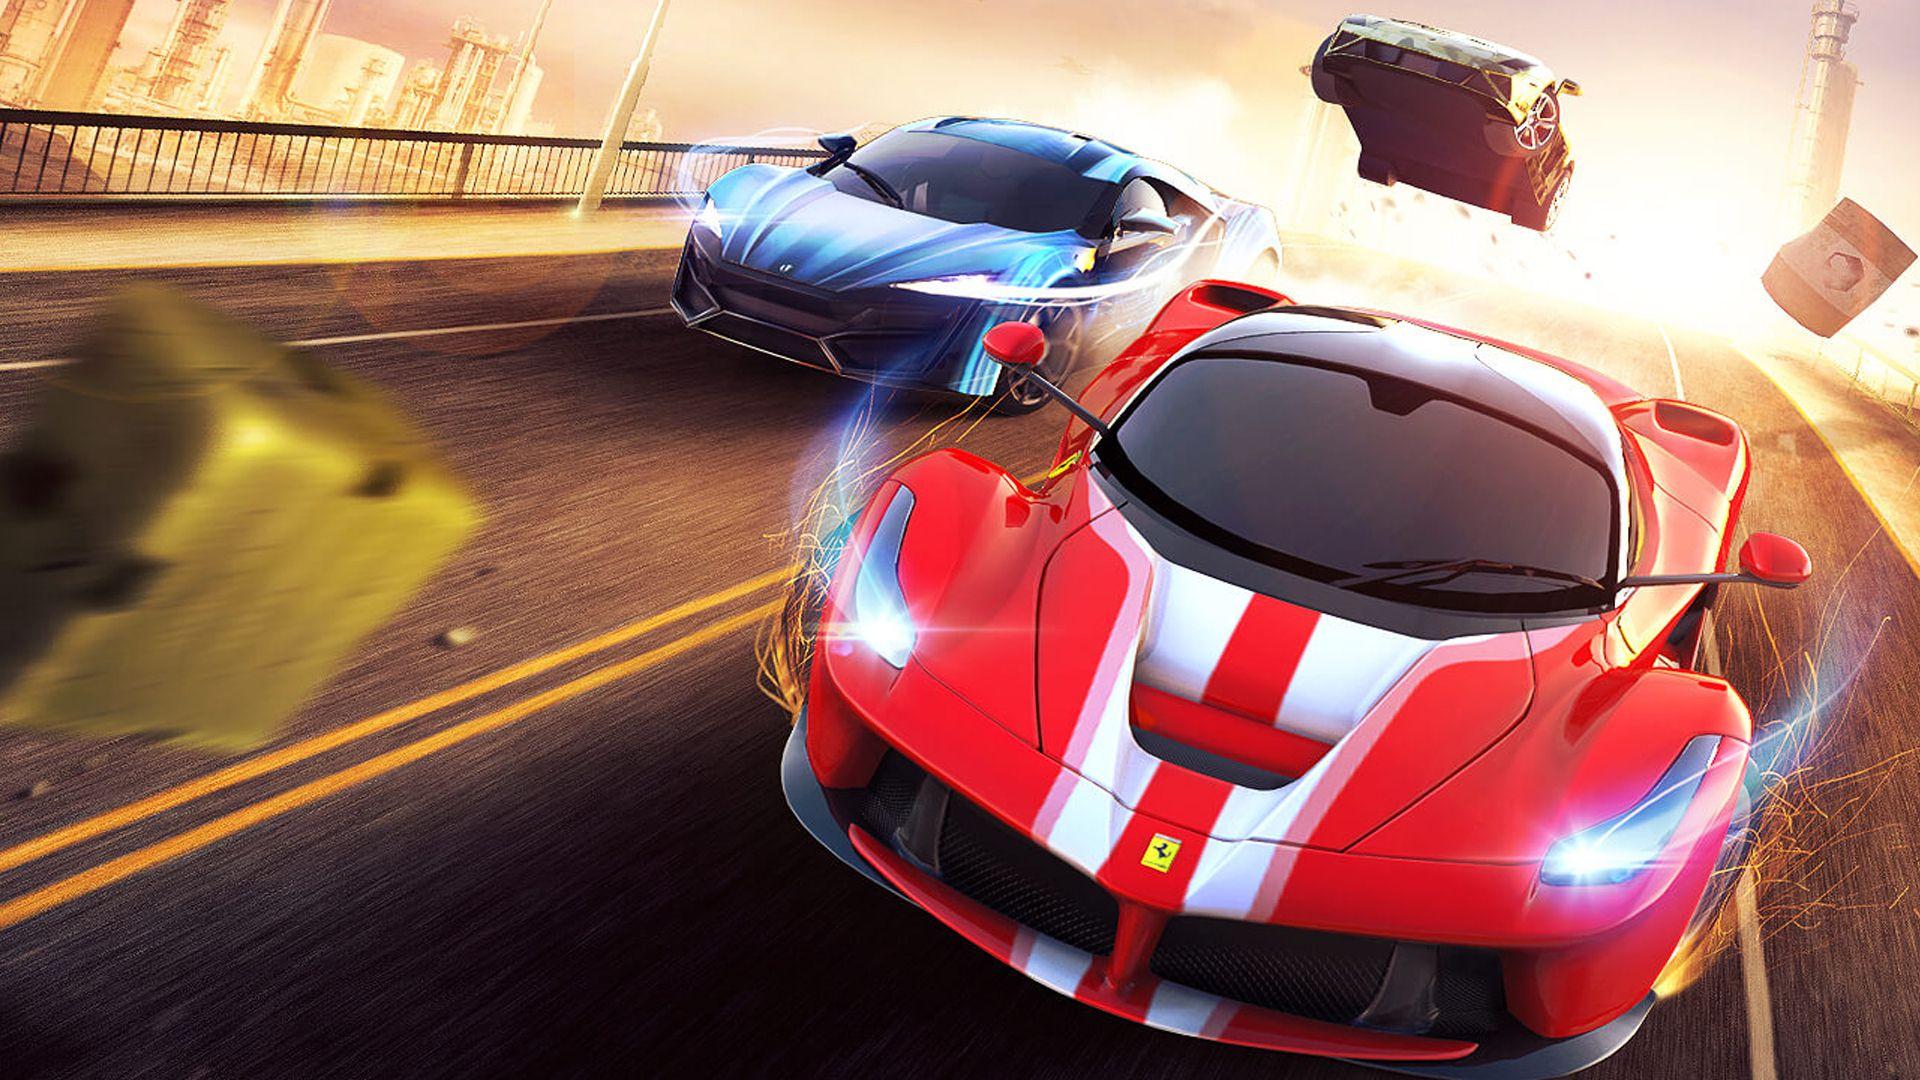 free download car racing games for pc windows 7 32bit